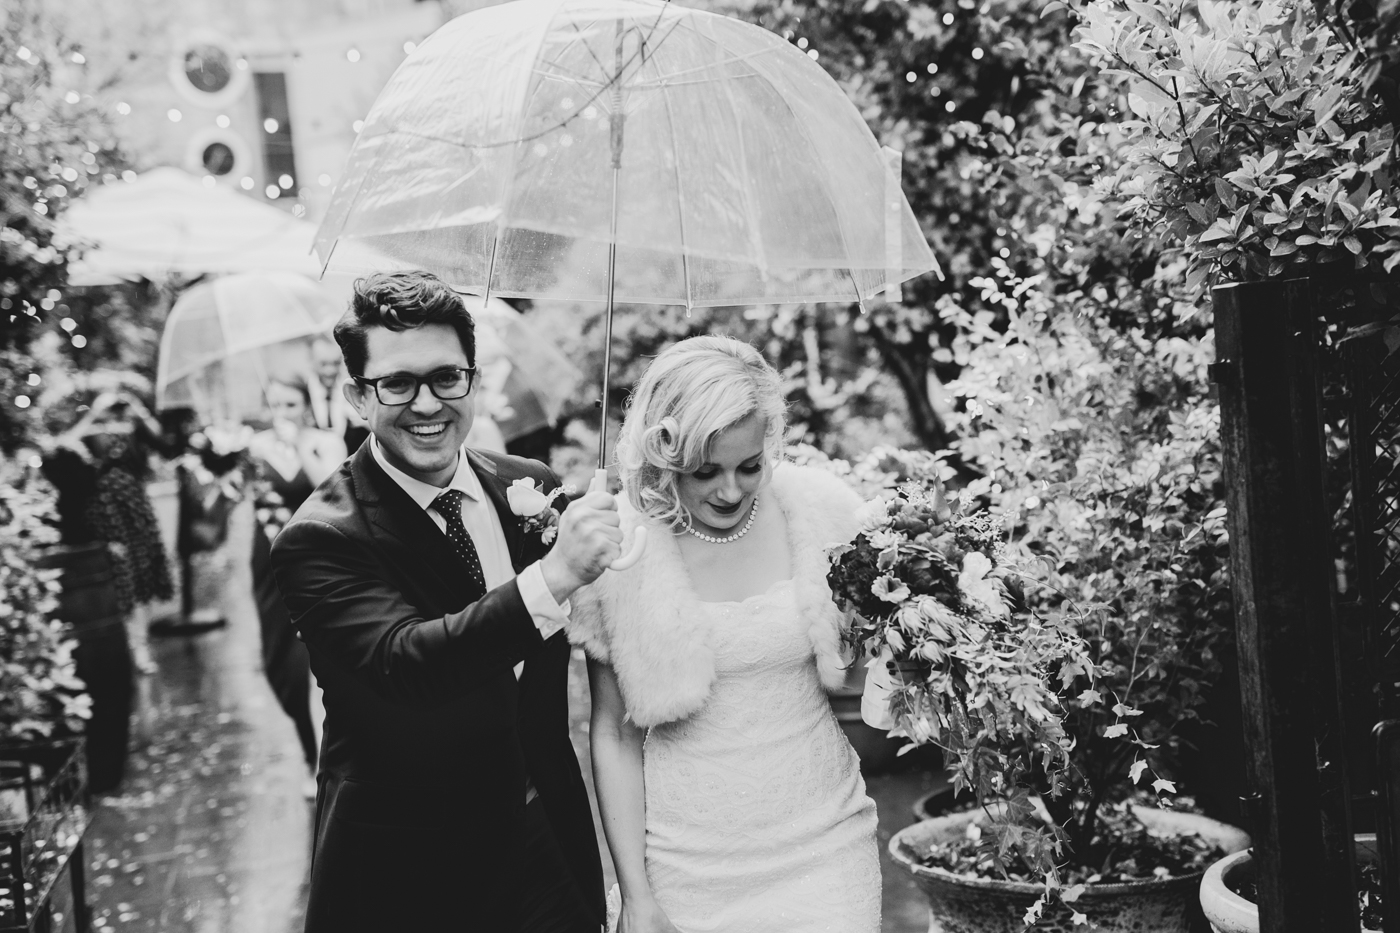 Jo & Tom Wedding - The Grounds of Alexandria - Samantha Heather Photography-195.jpg